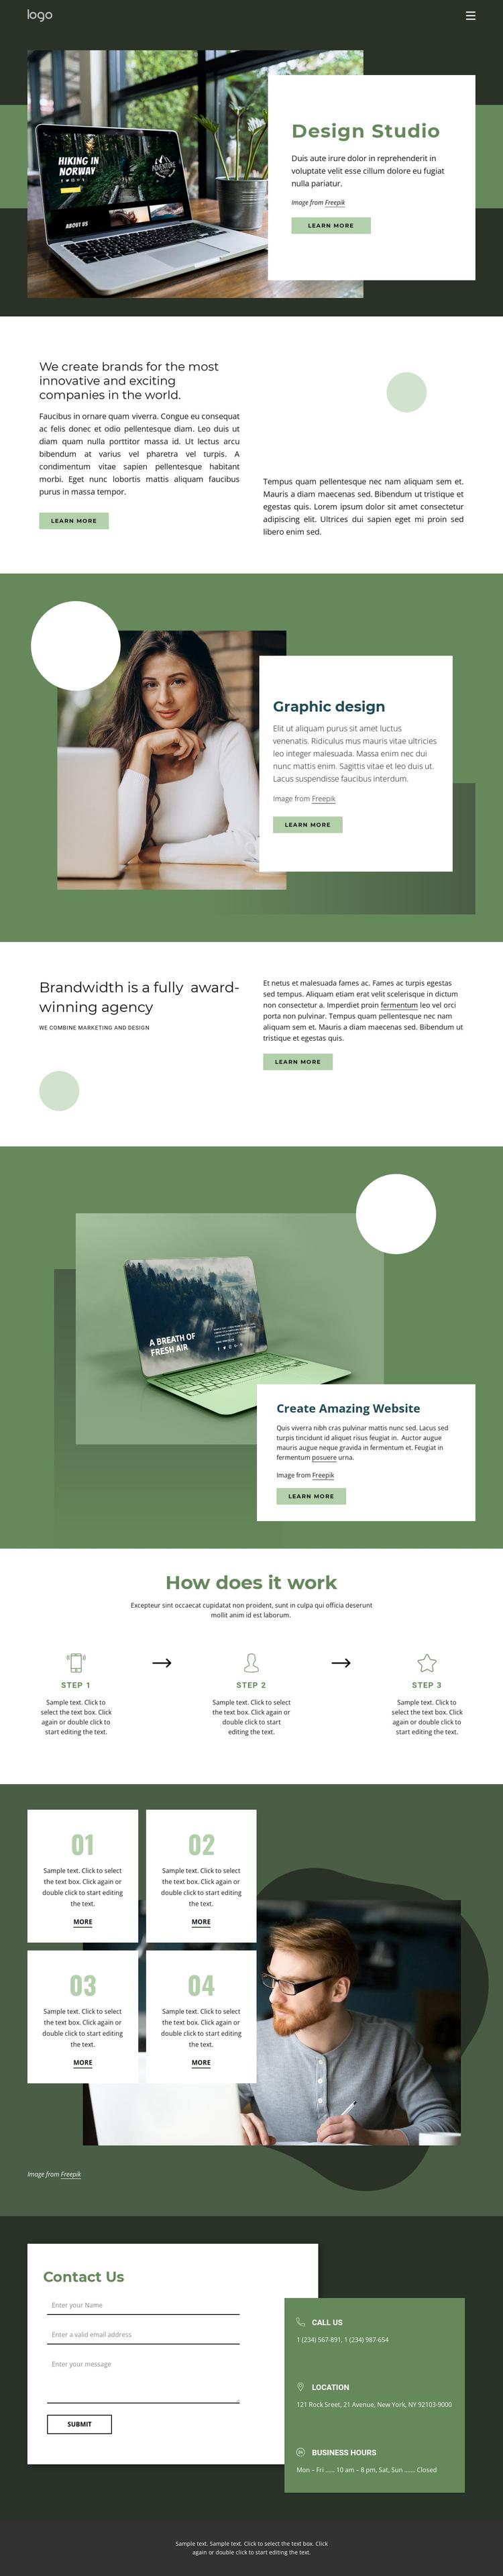 Design inspiration from nature Website Builder Software